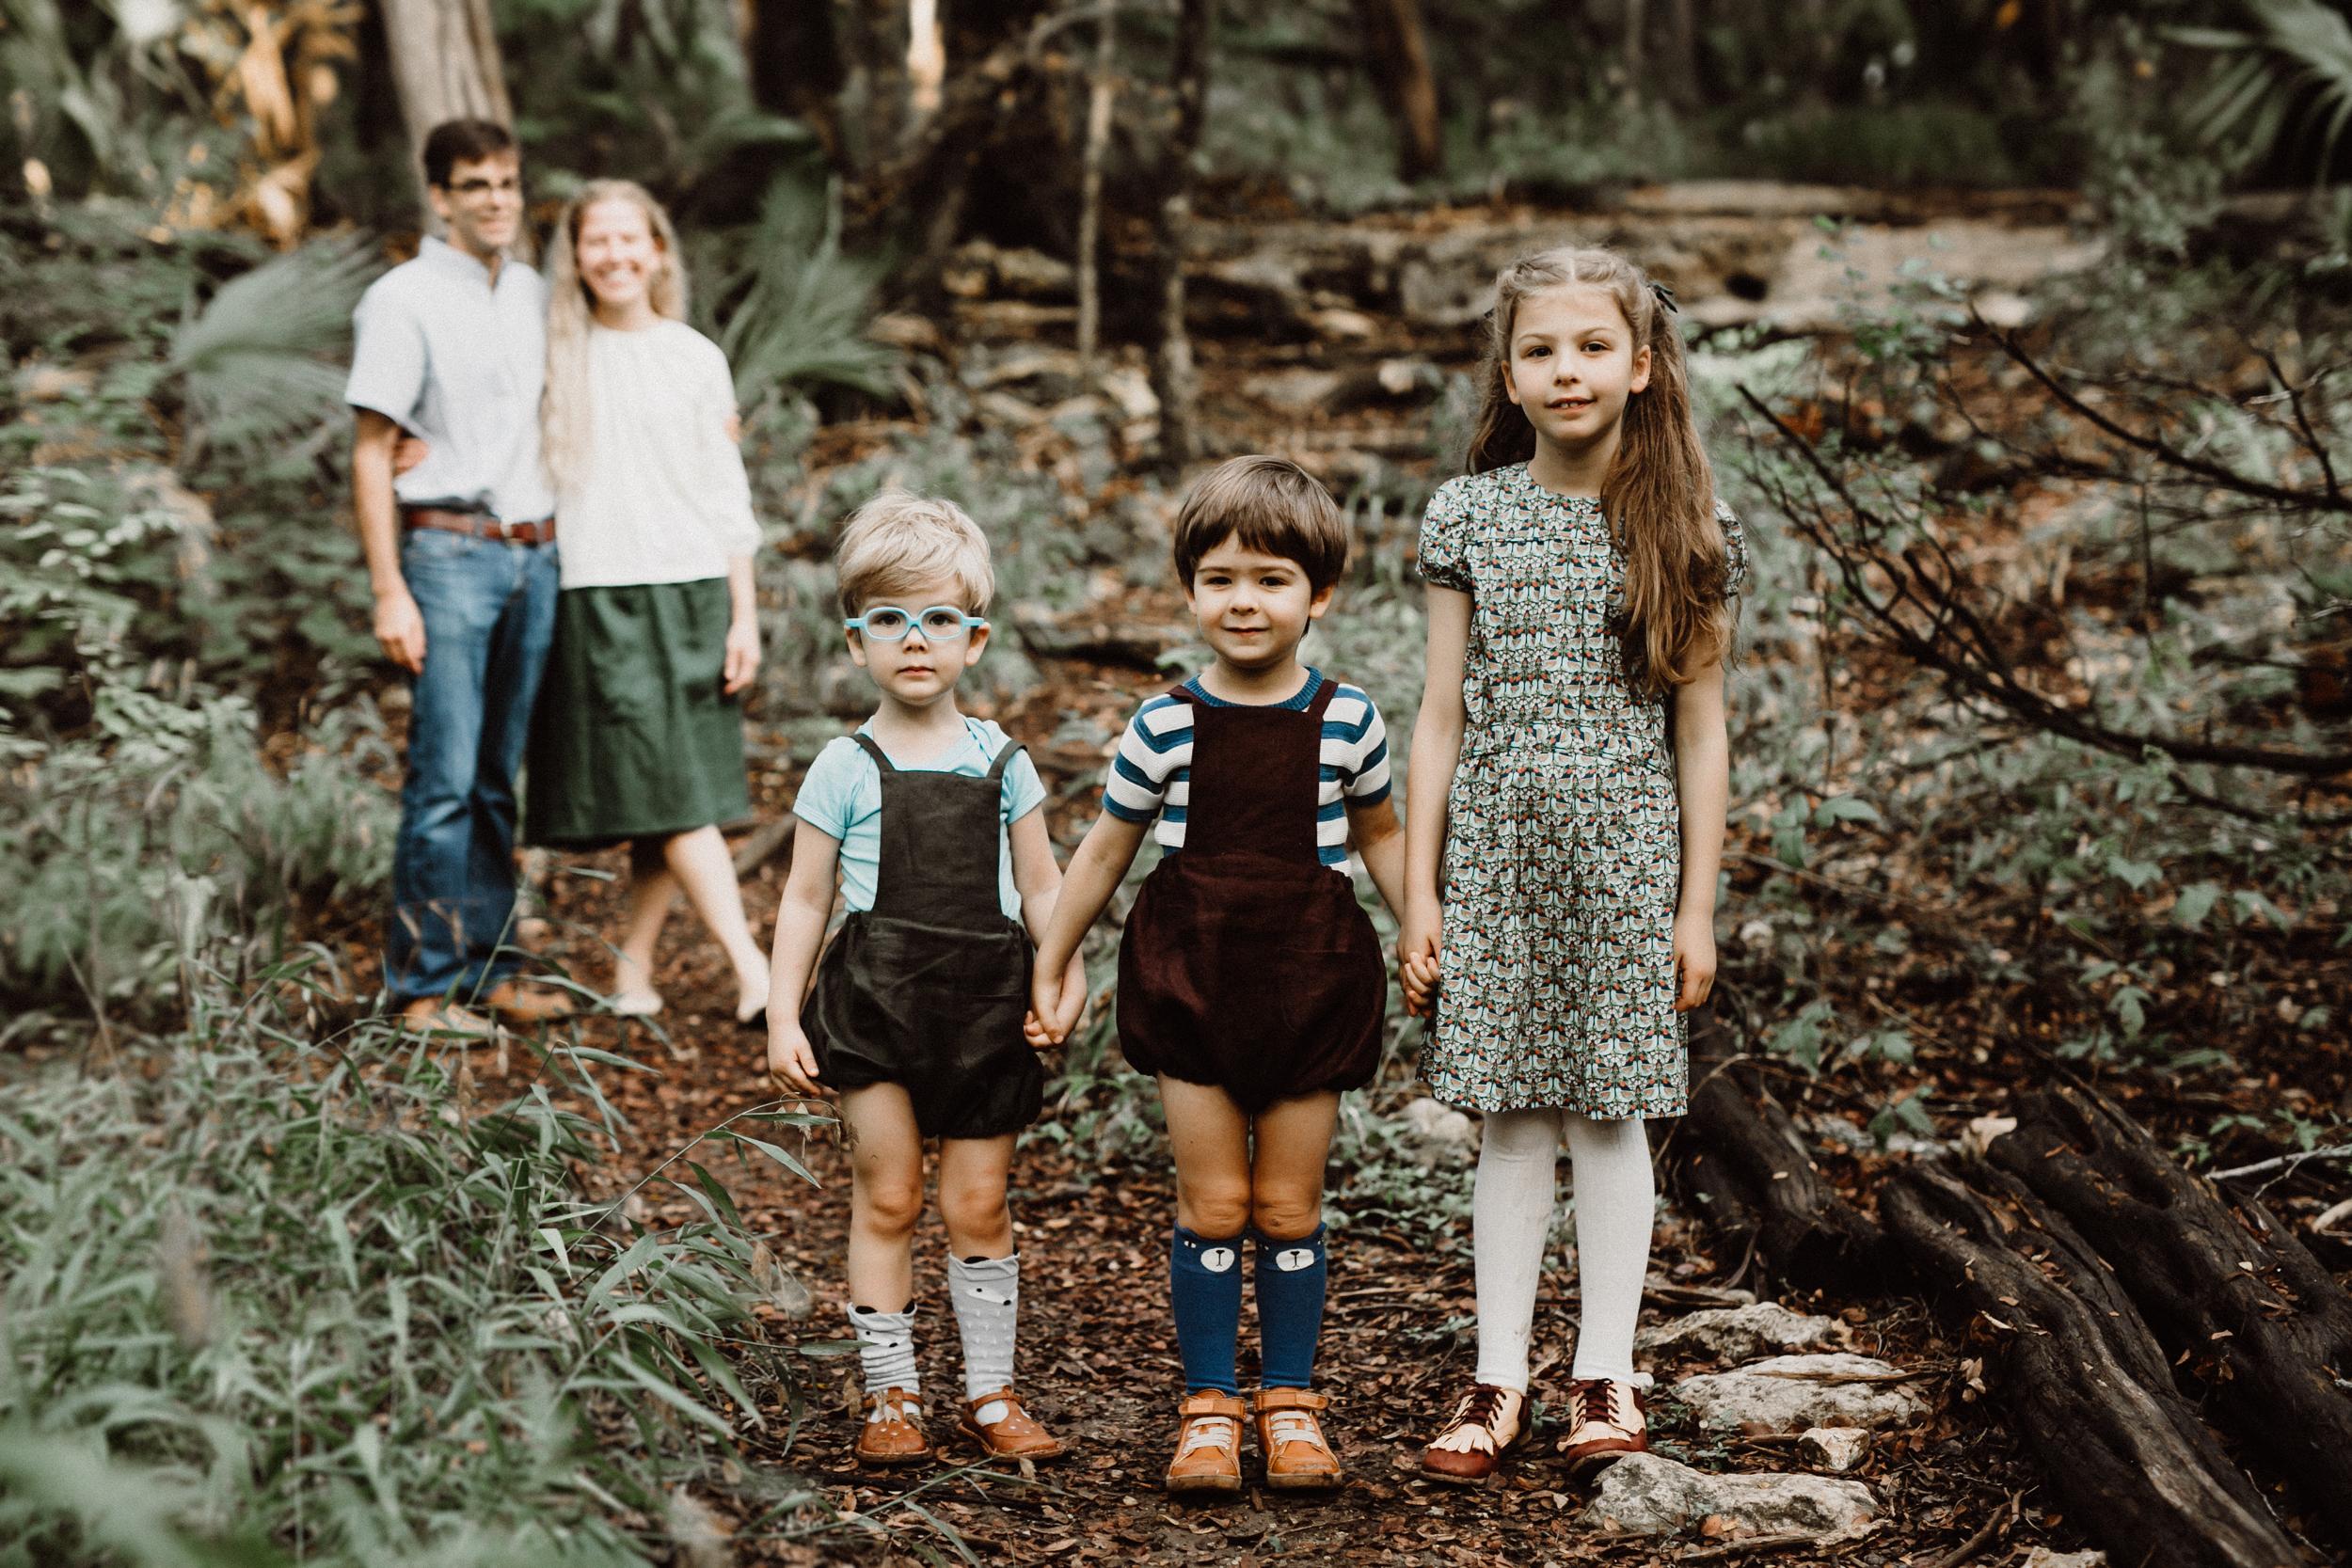 mayfield-park-natural-family-session-senning-97.jpg